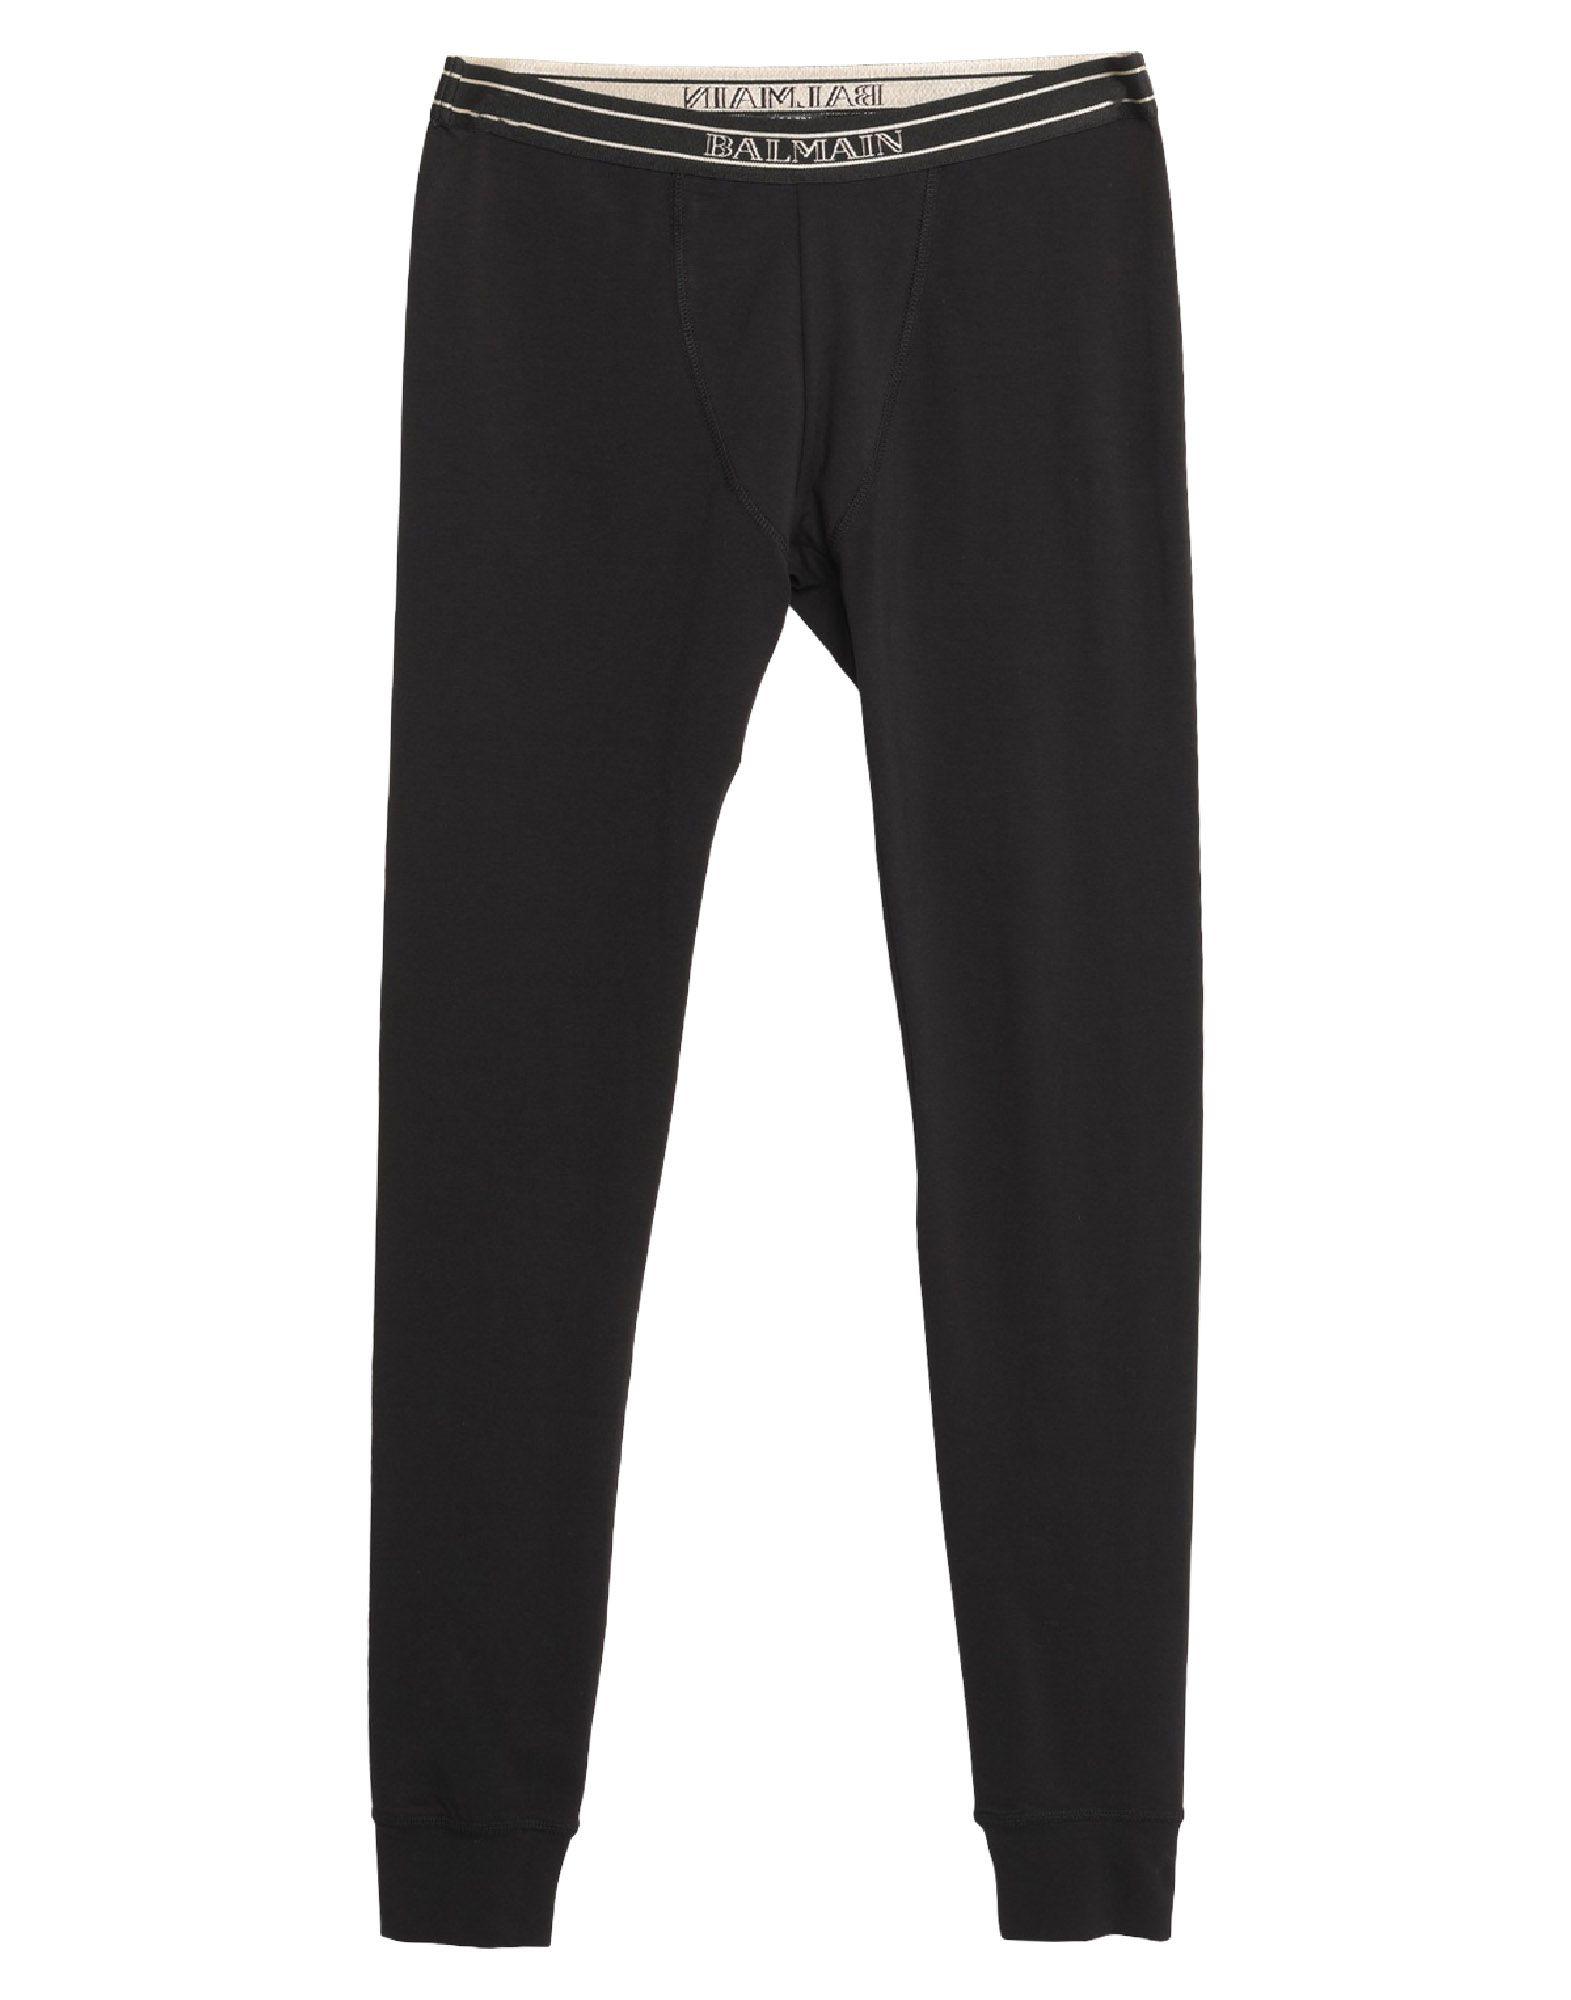 BALMAIN Leggings. jersey, solid color, logo, low waisted, slim fit, tapered leg, elasticized waist, no pockets, stretch. 94% Cotton, 6% Elastane